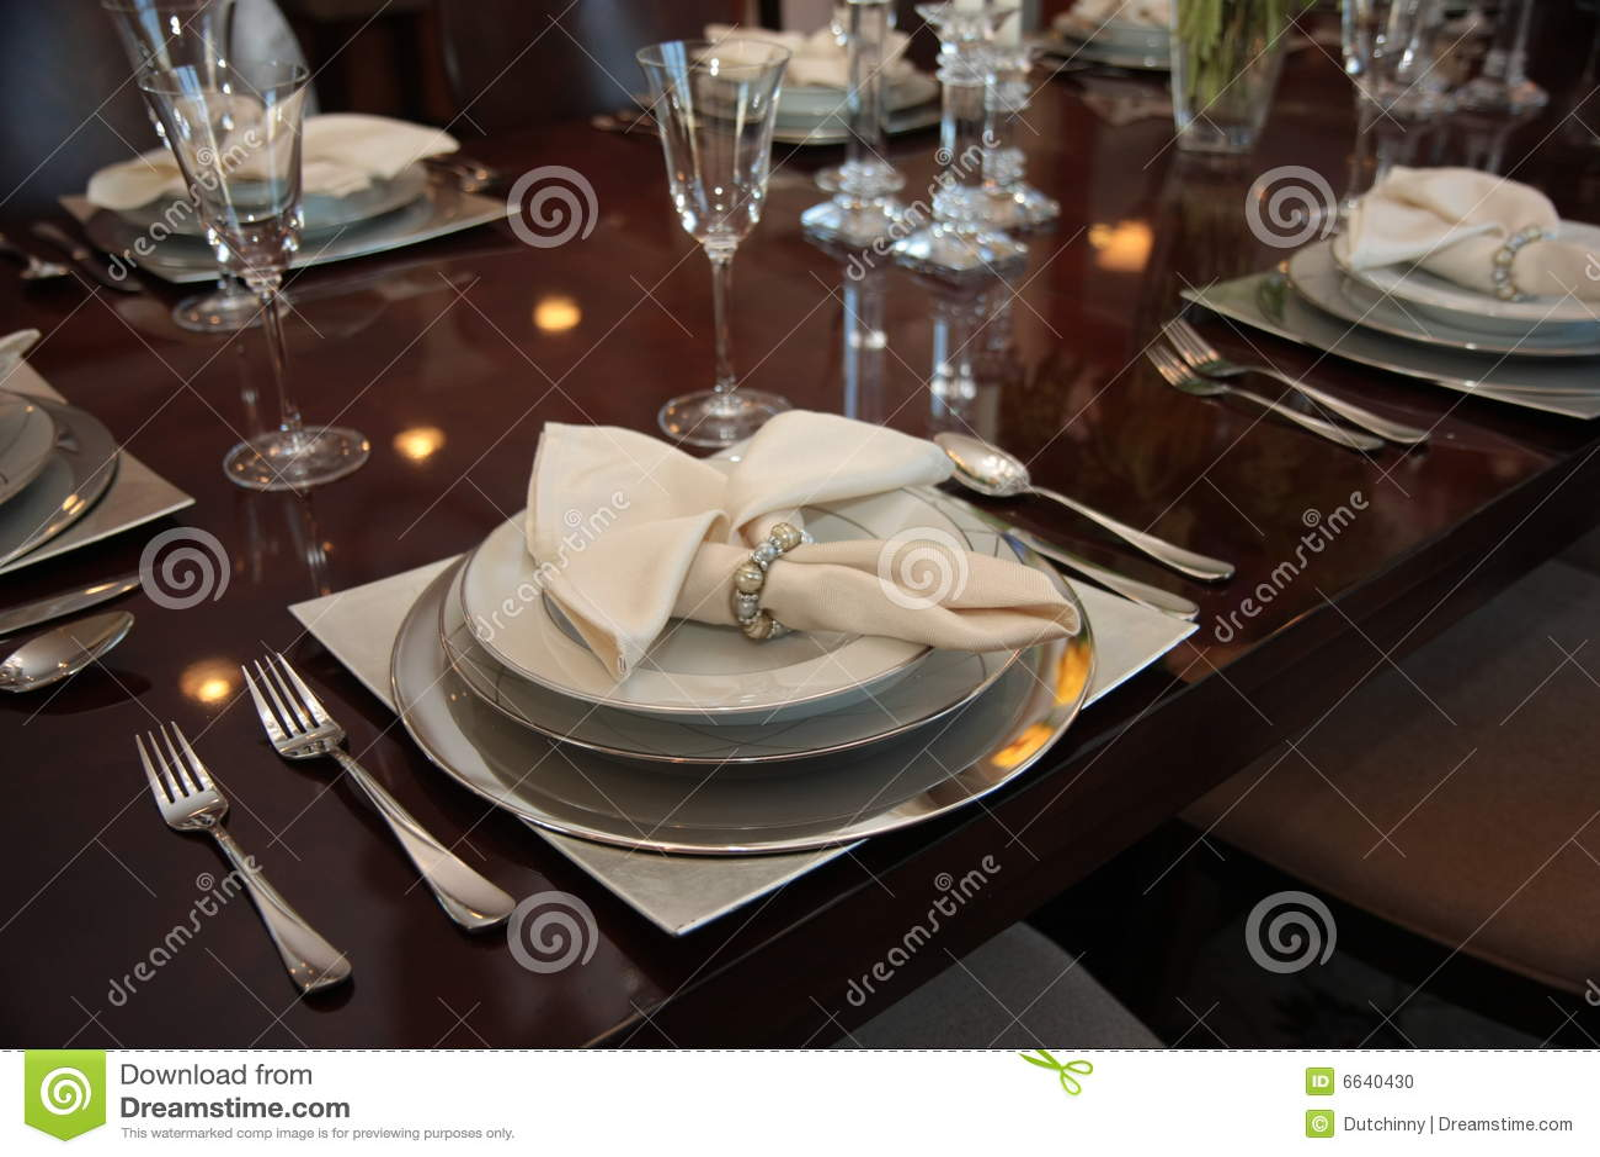 Formal Dinner Place Settings Stock Photo Image Of Lavish